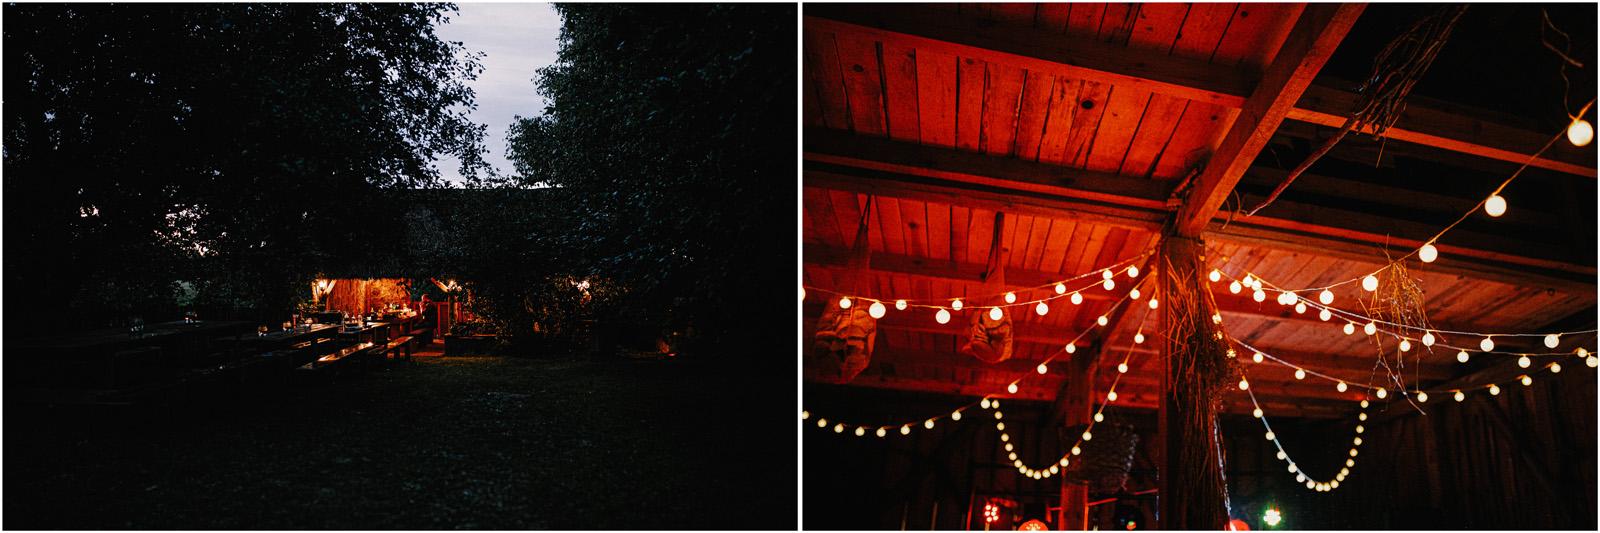 Agatka & Mati | garden party i impreza w stodole 68